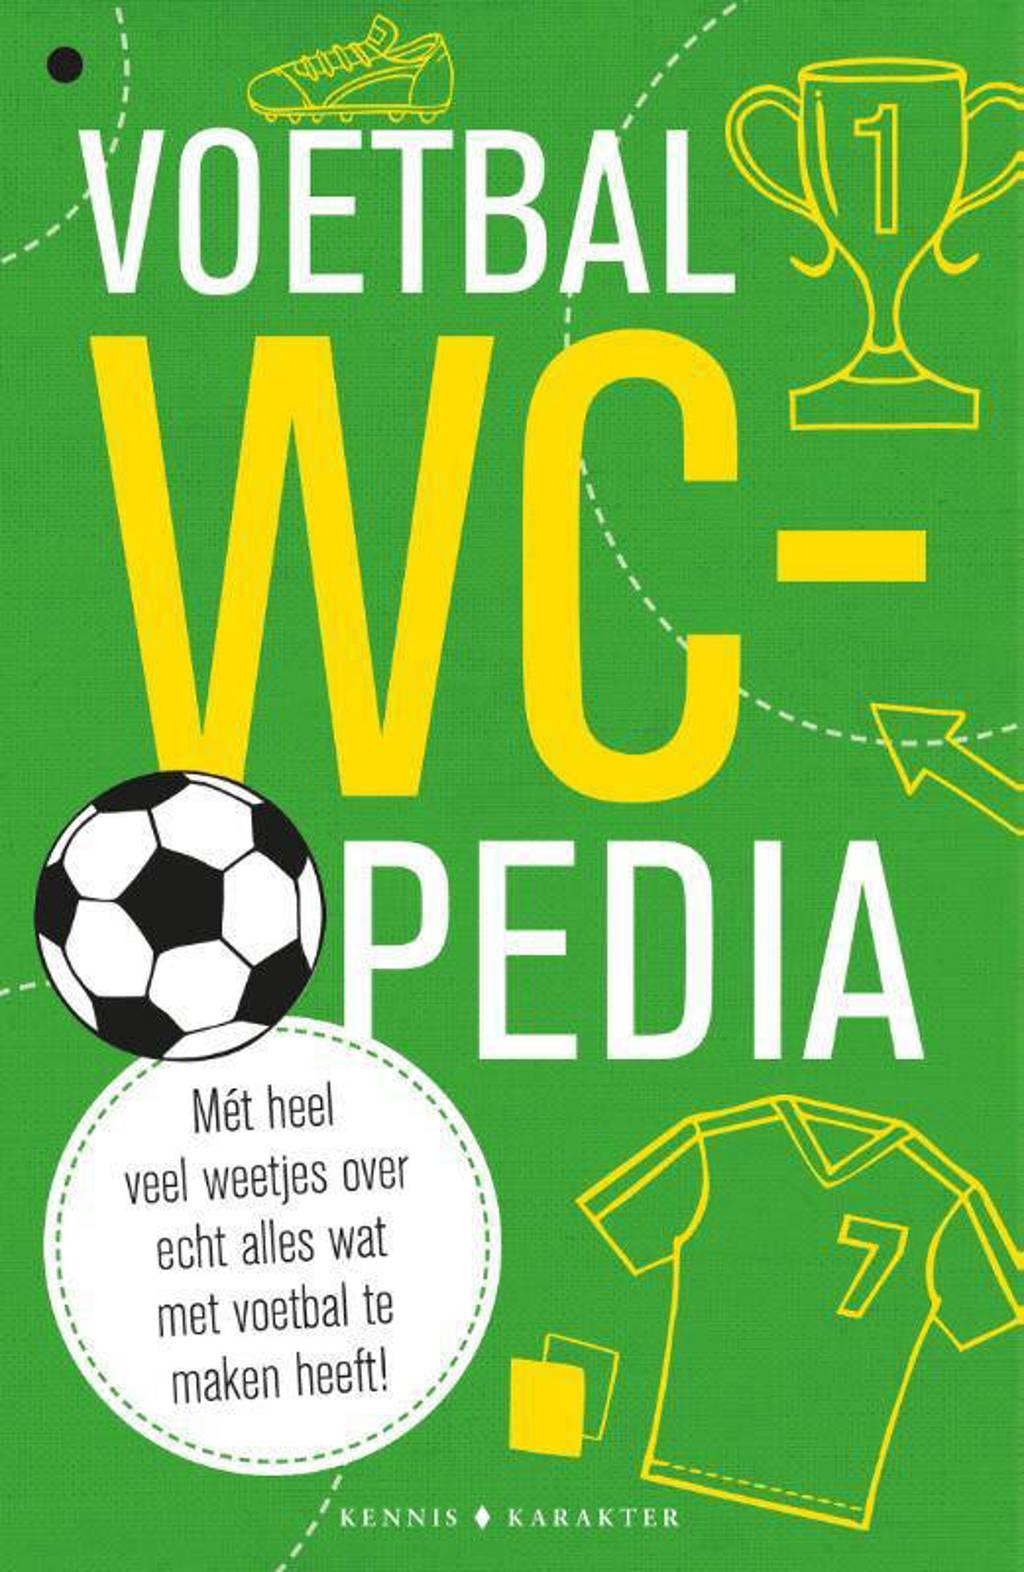 Voetbal WC-pedia - Studio Pym